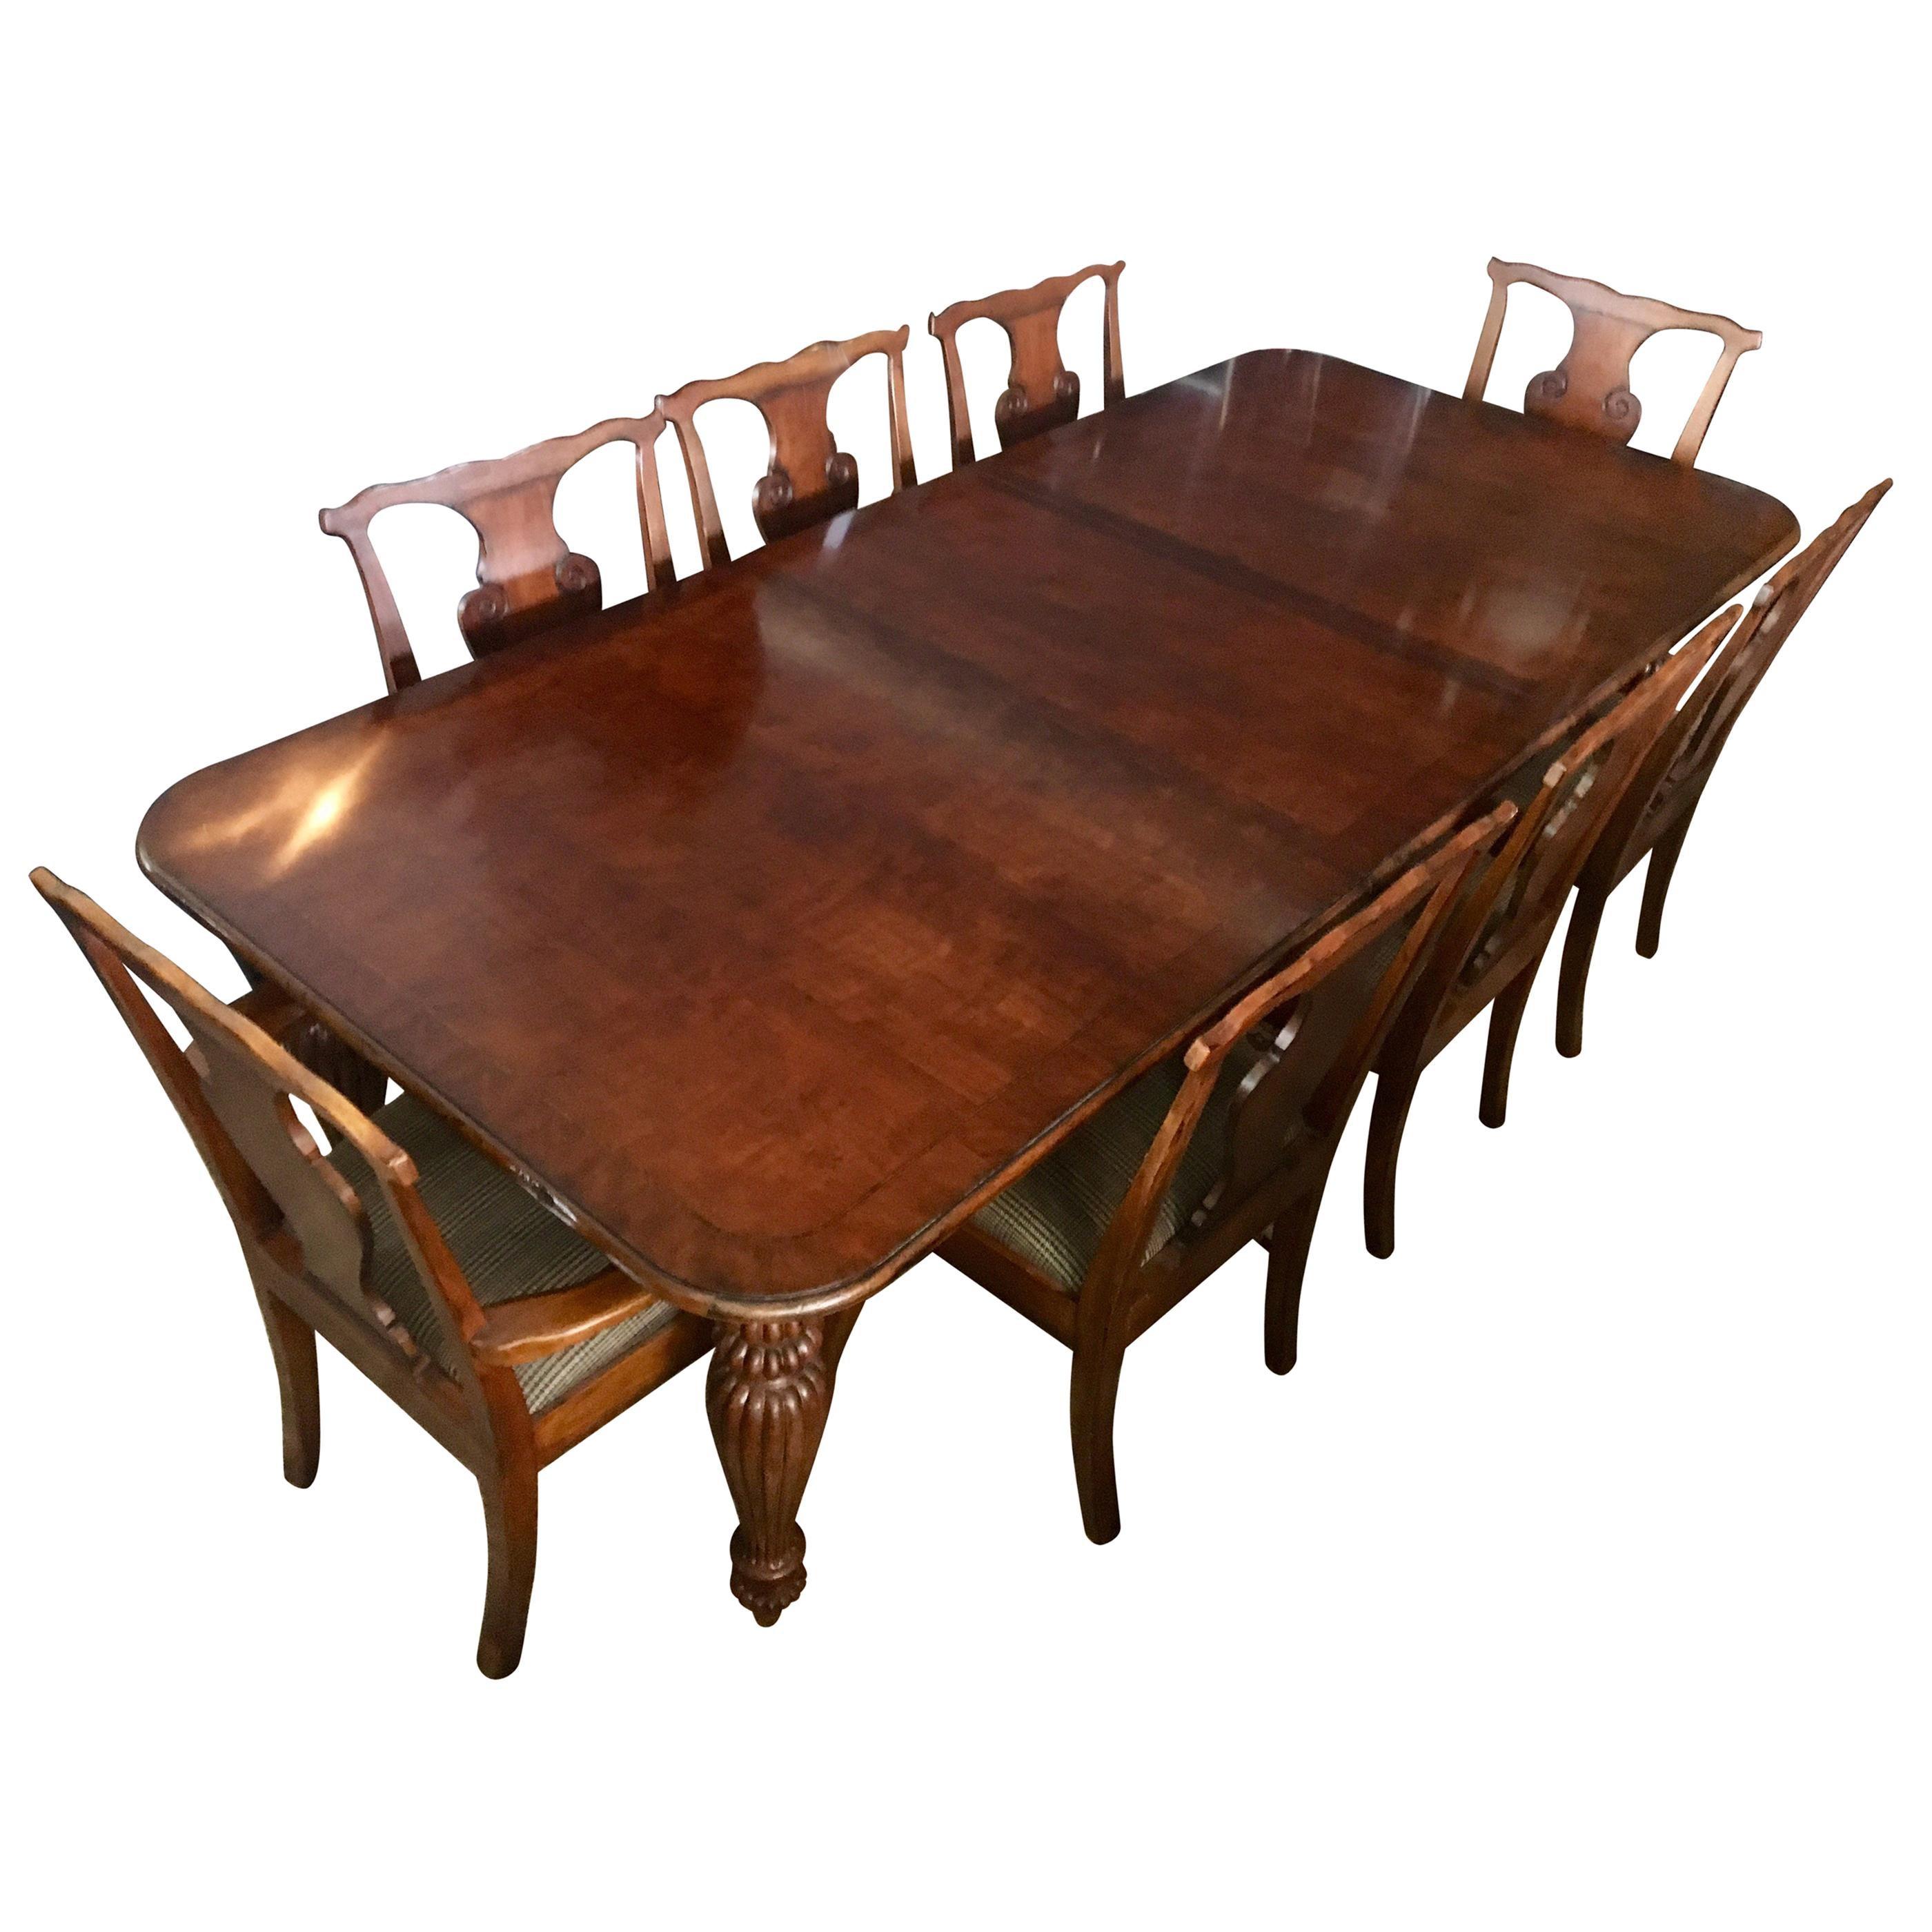 Ralph Lauren Henredon Mahogany Dining Room Set Table and ...